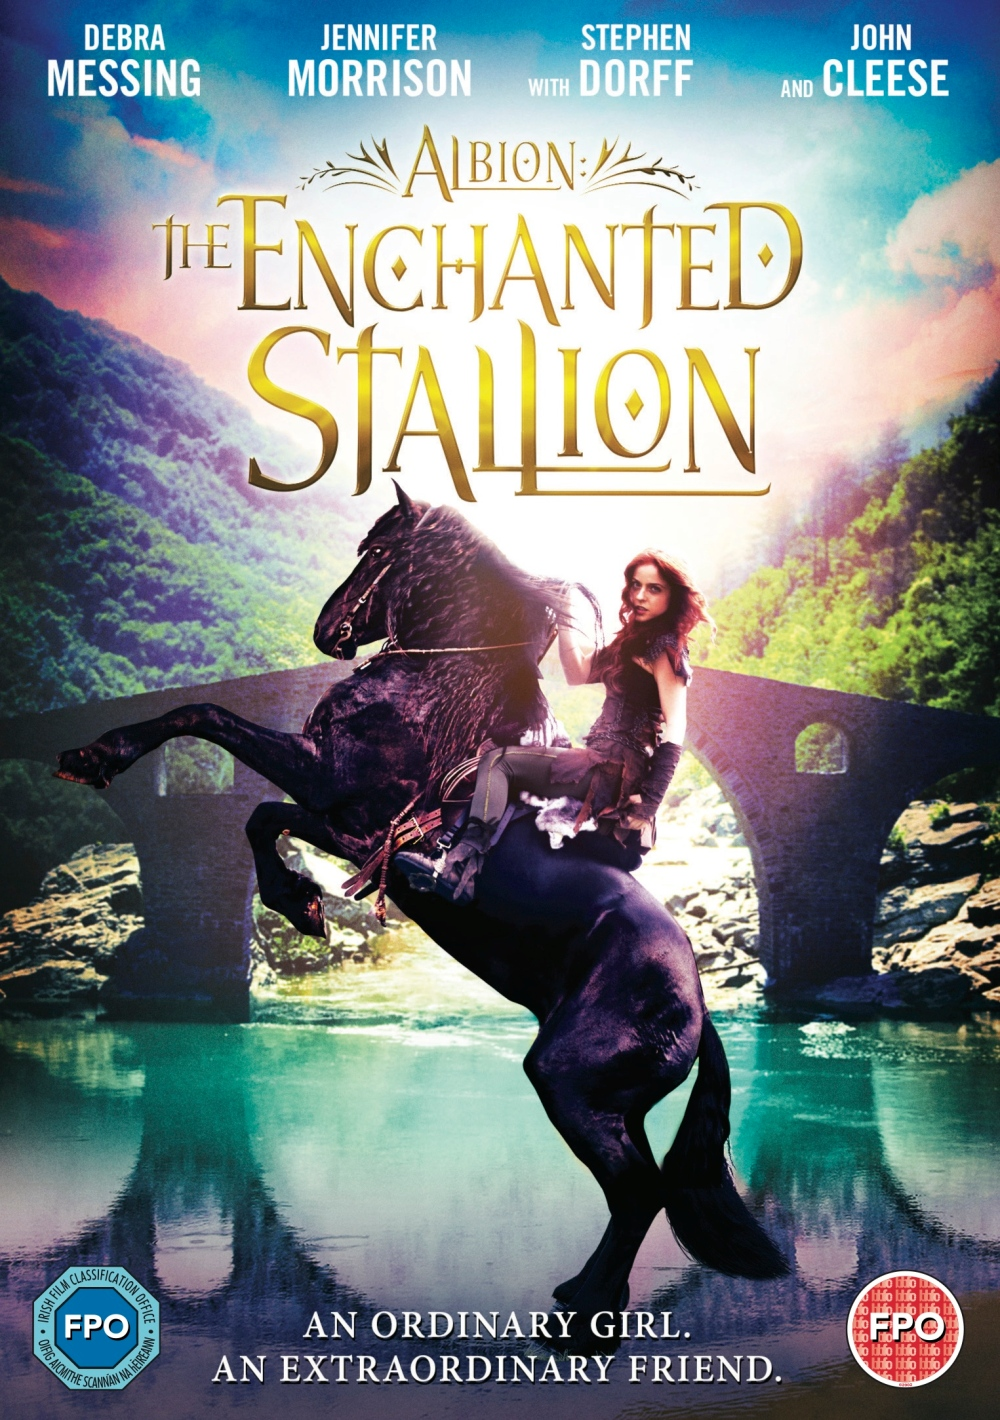 Albion DVD cover copy